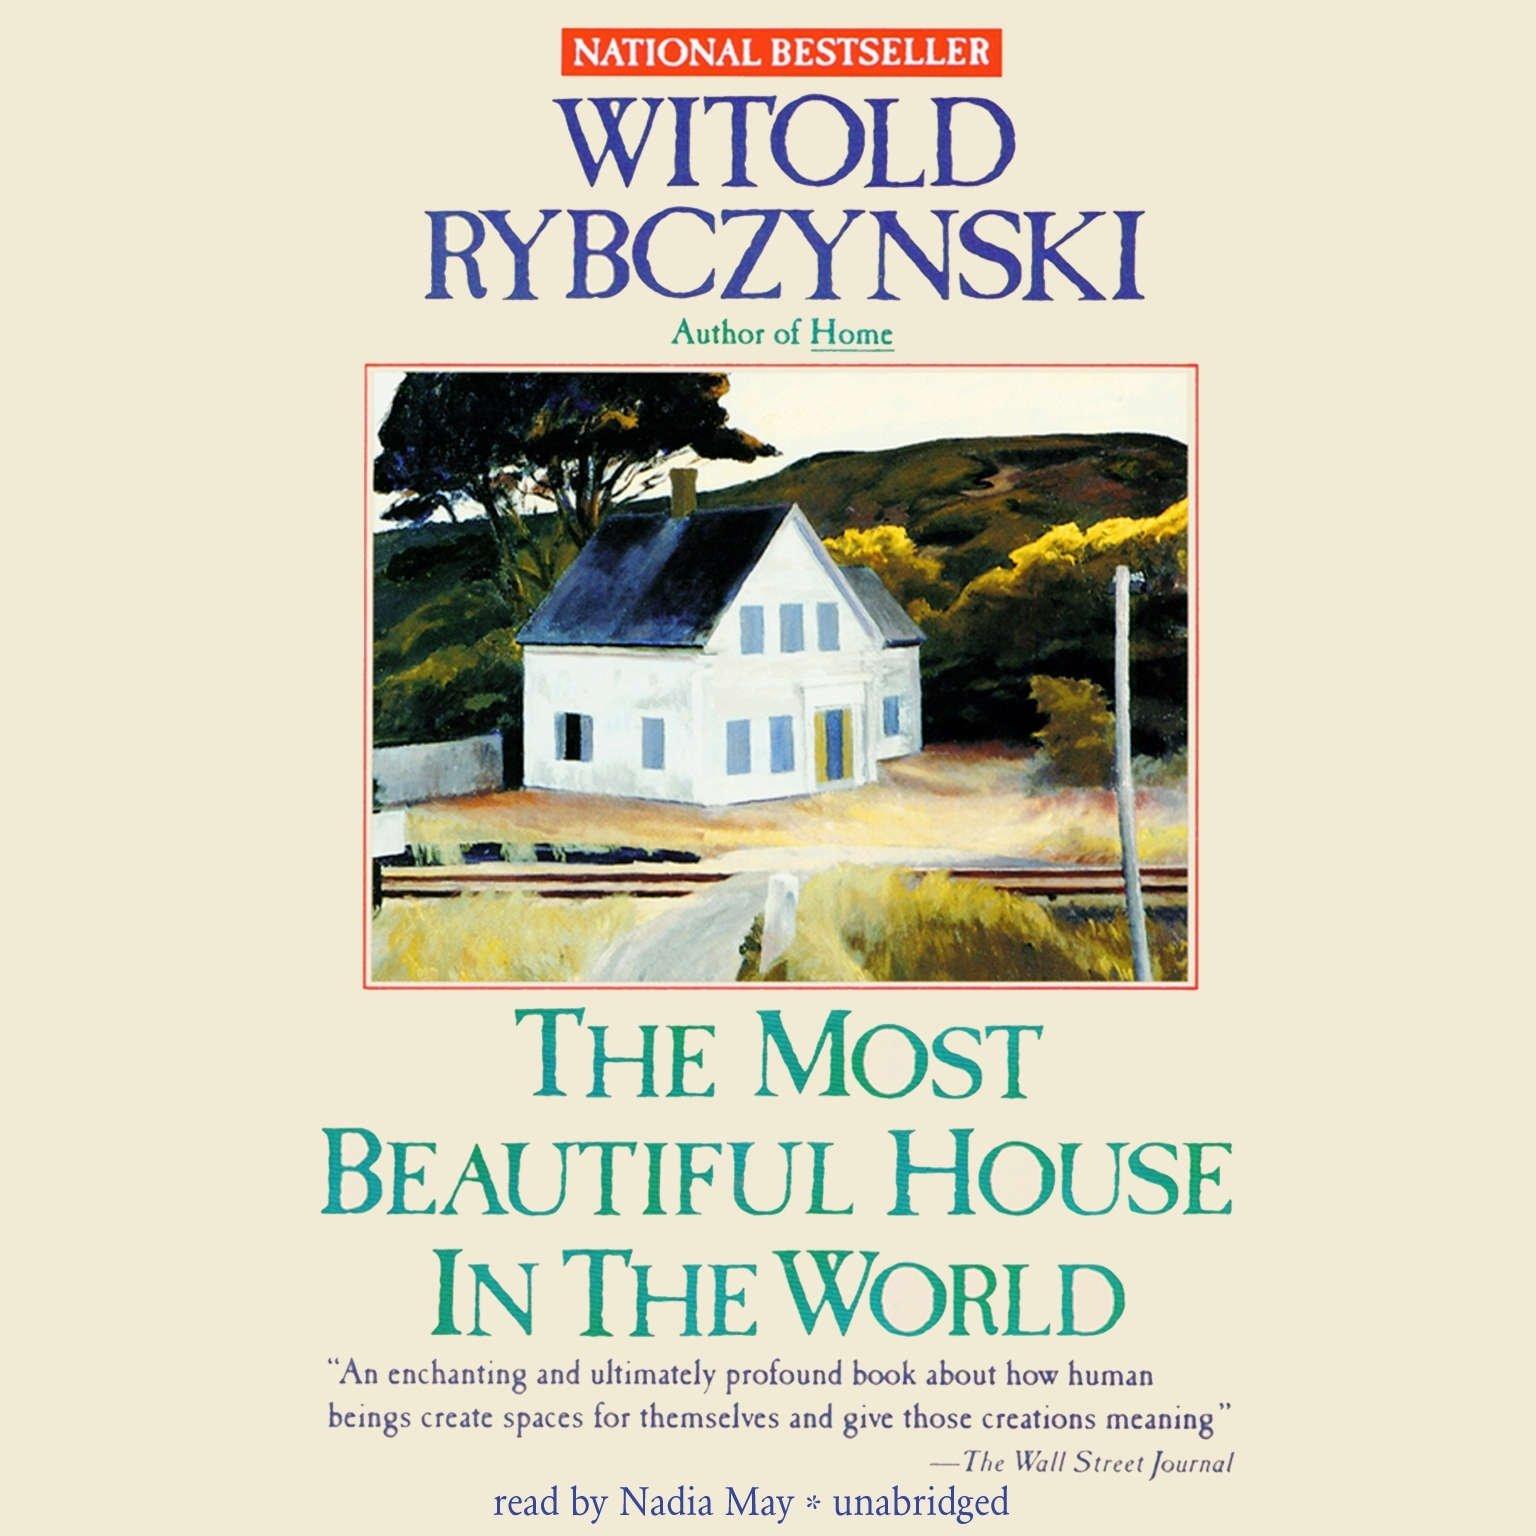 10 Gorgeous Home A Short History Of An Idea home audiobookwitold rybczynski readwanda mccaddon 2020